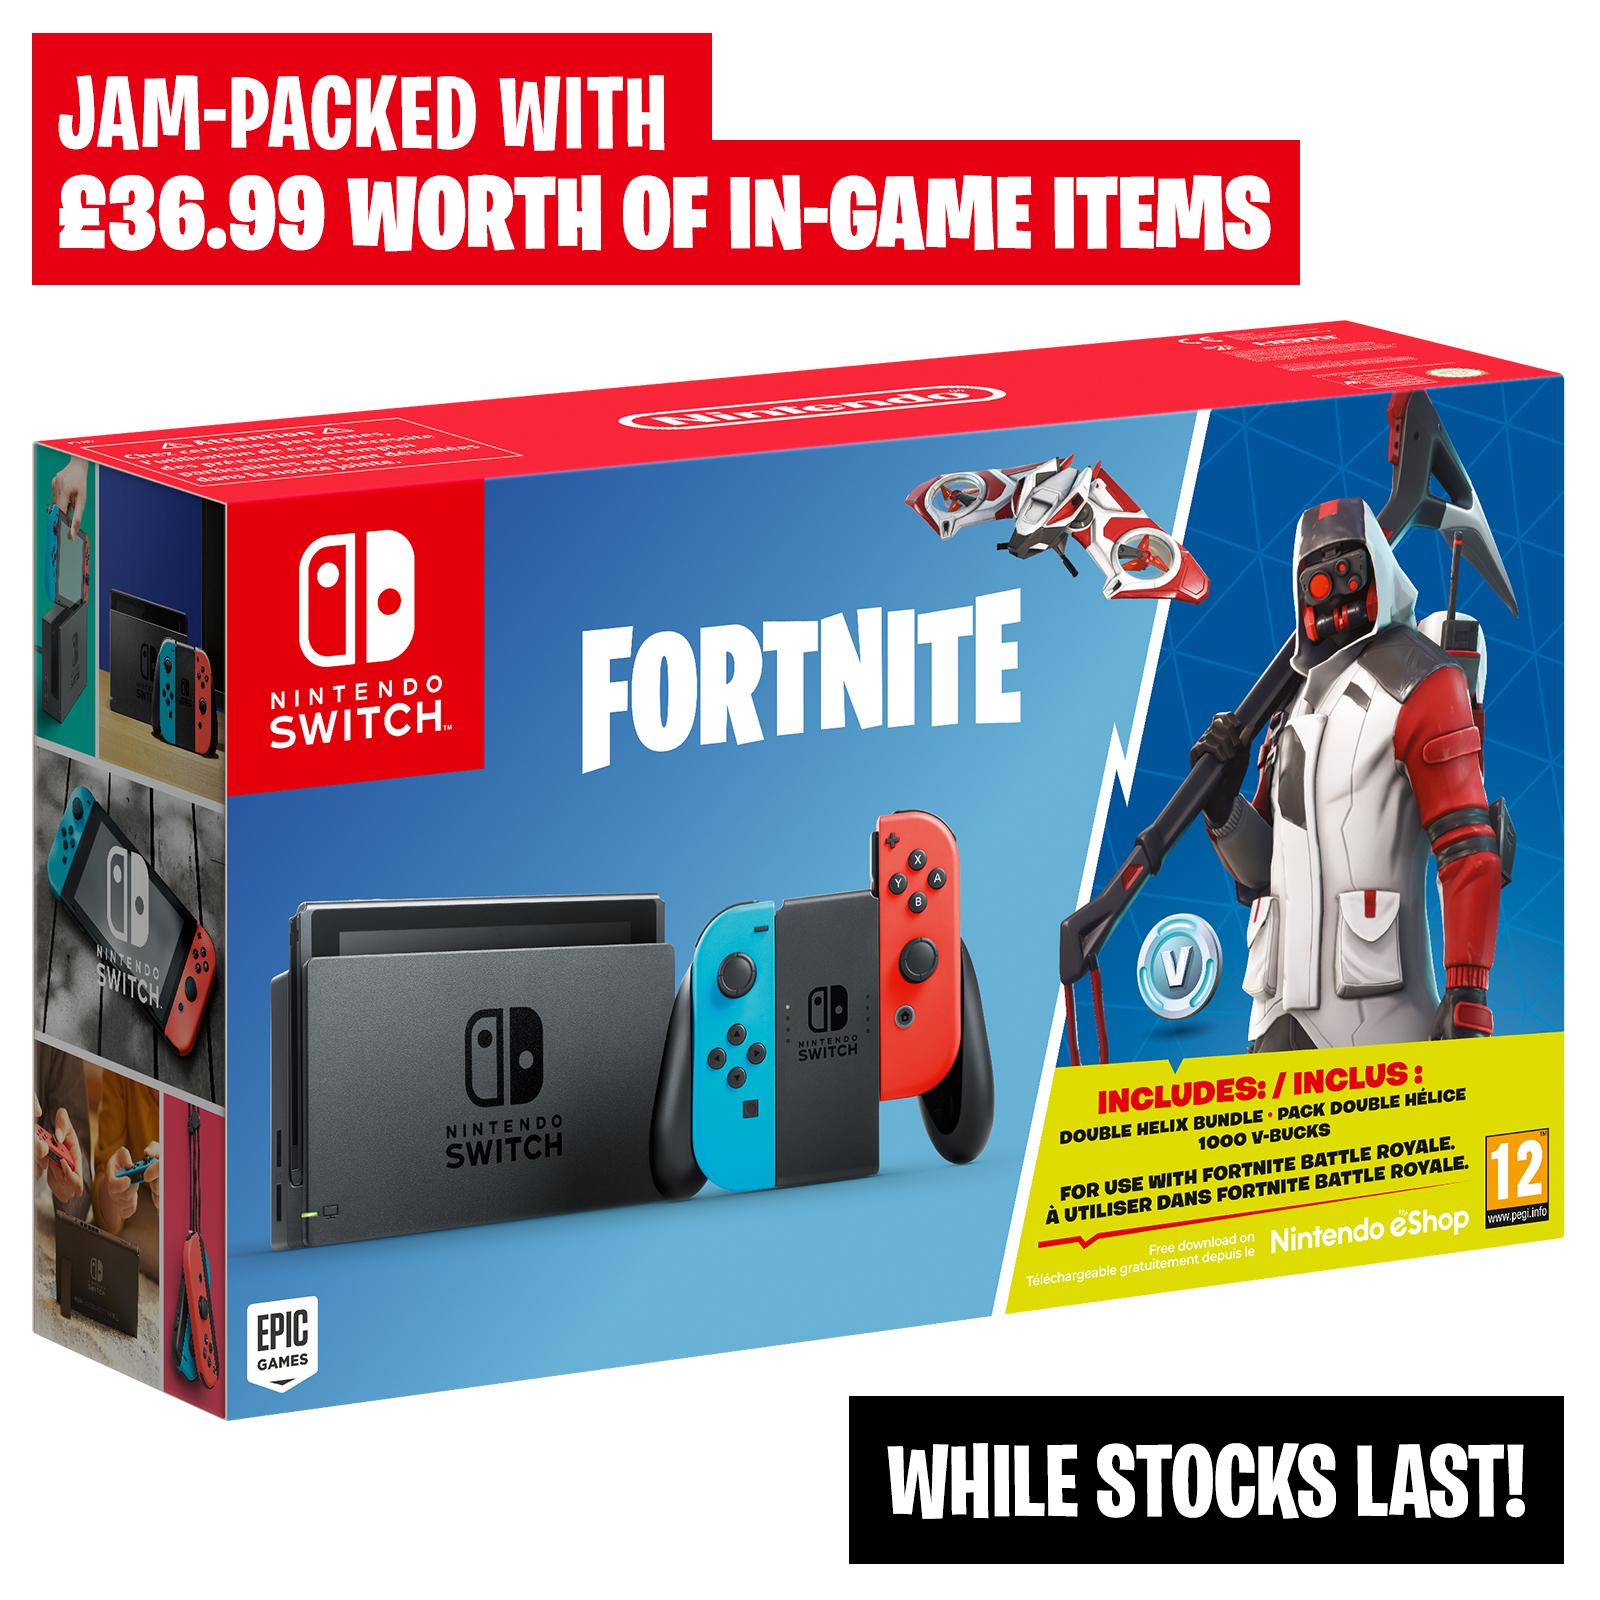 Nintendo Switch Limited Edition Fortnite Bundle Incl 1000 V Bucks Double Helix Bundle Nintendo Official Uk Store